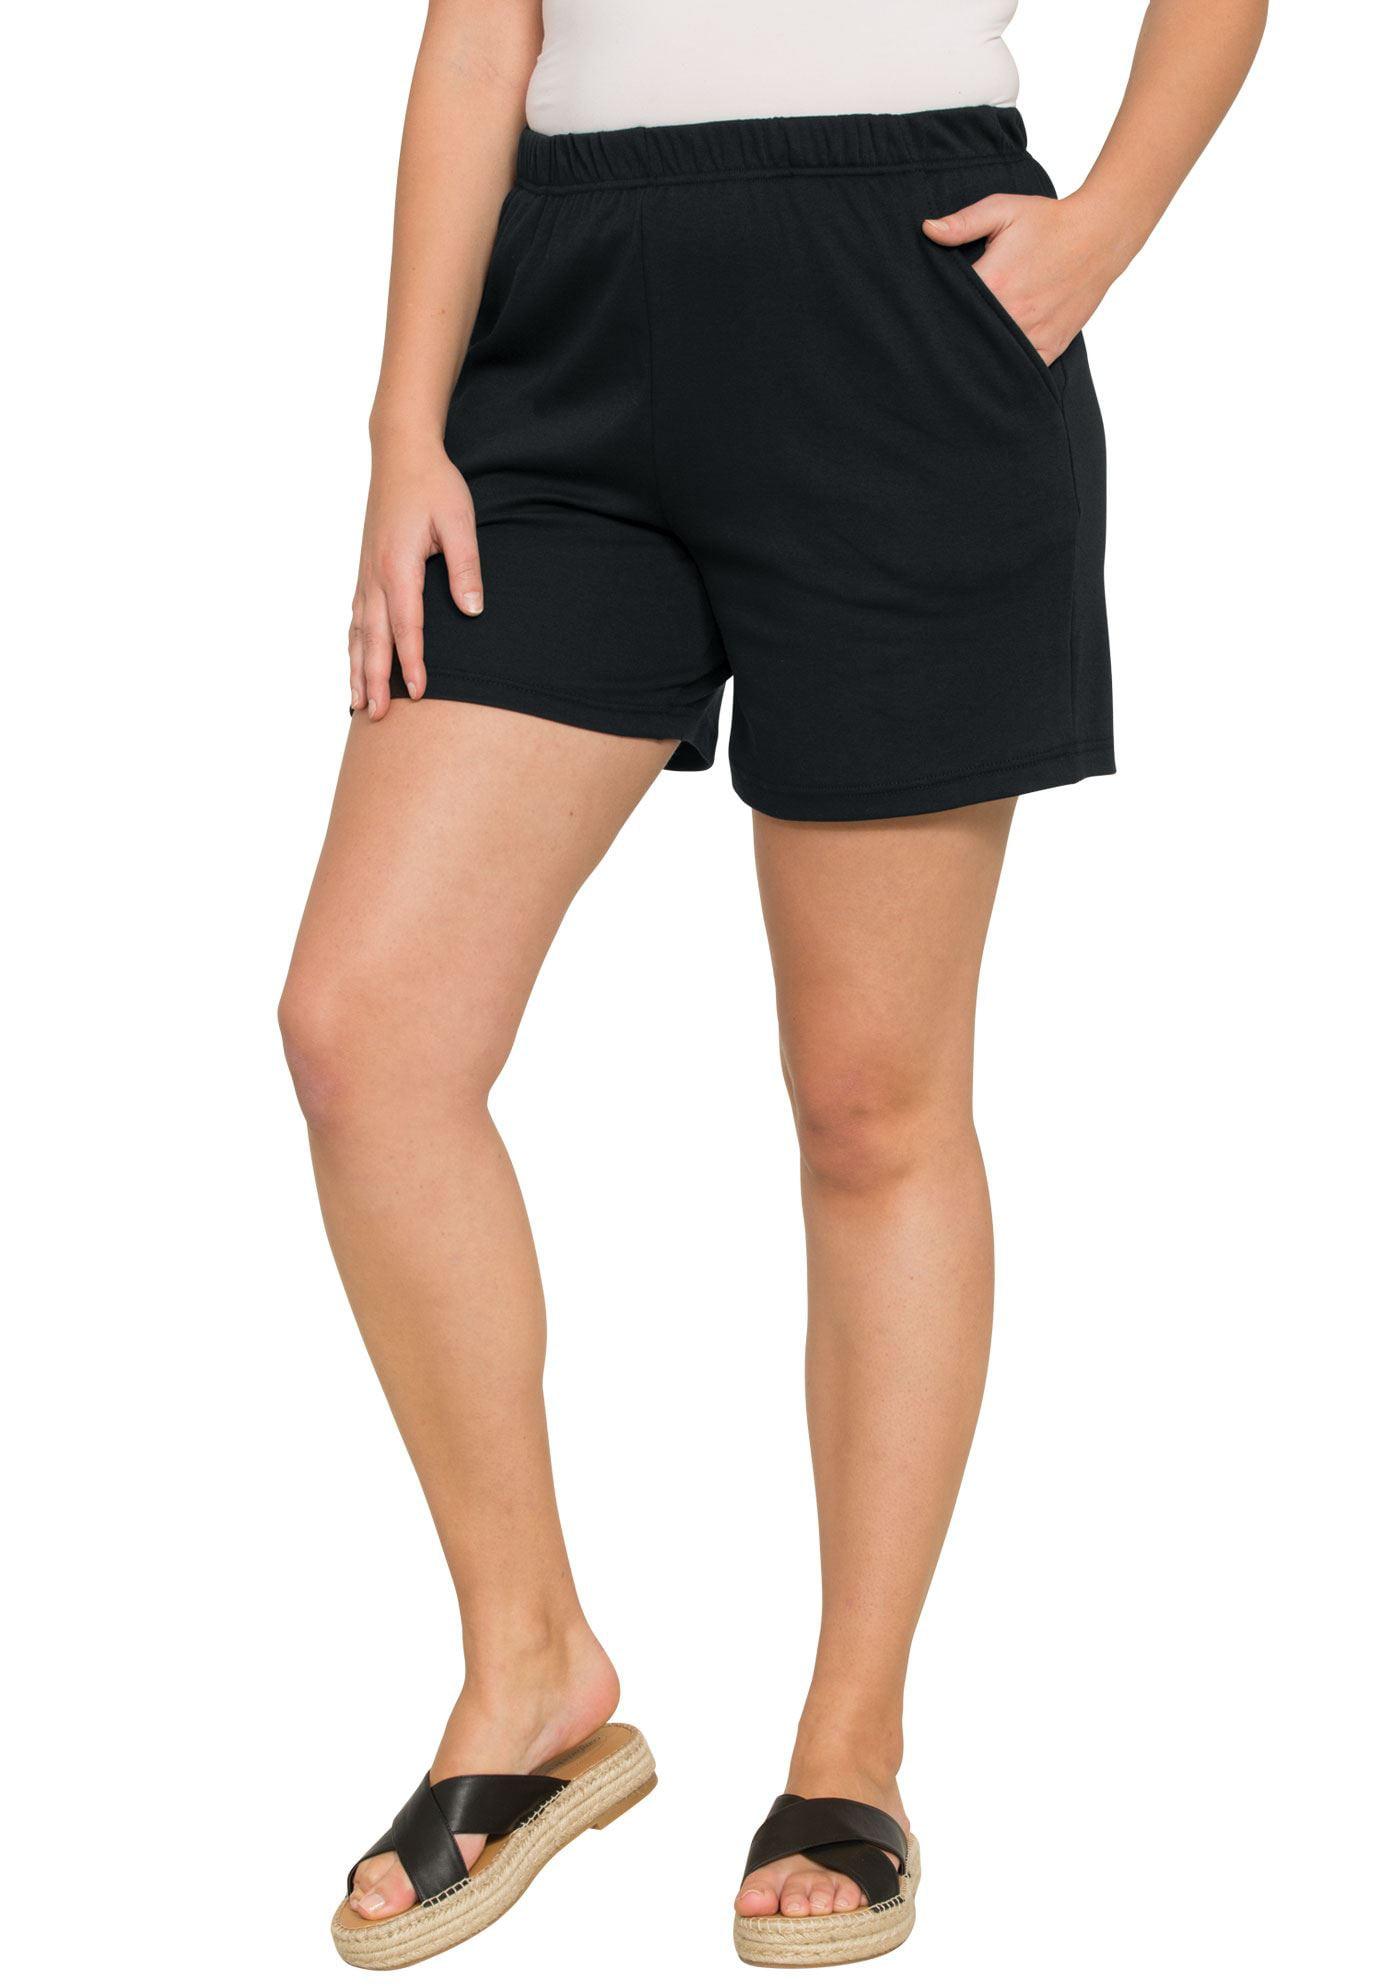 Roaman's Plus Size Soft Knit Shorts